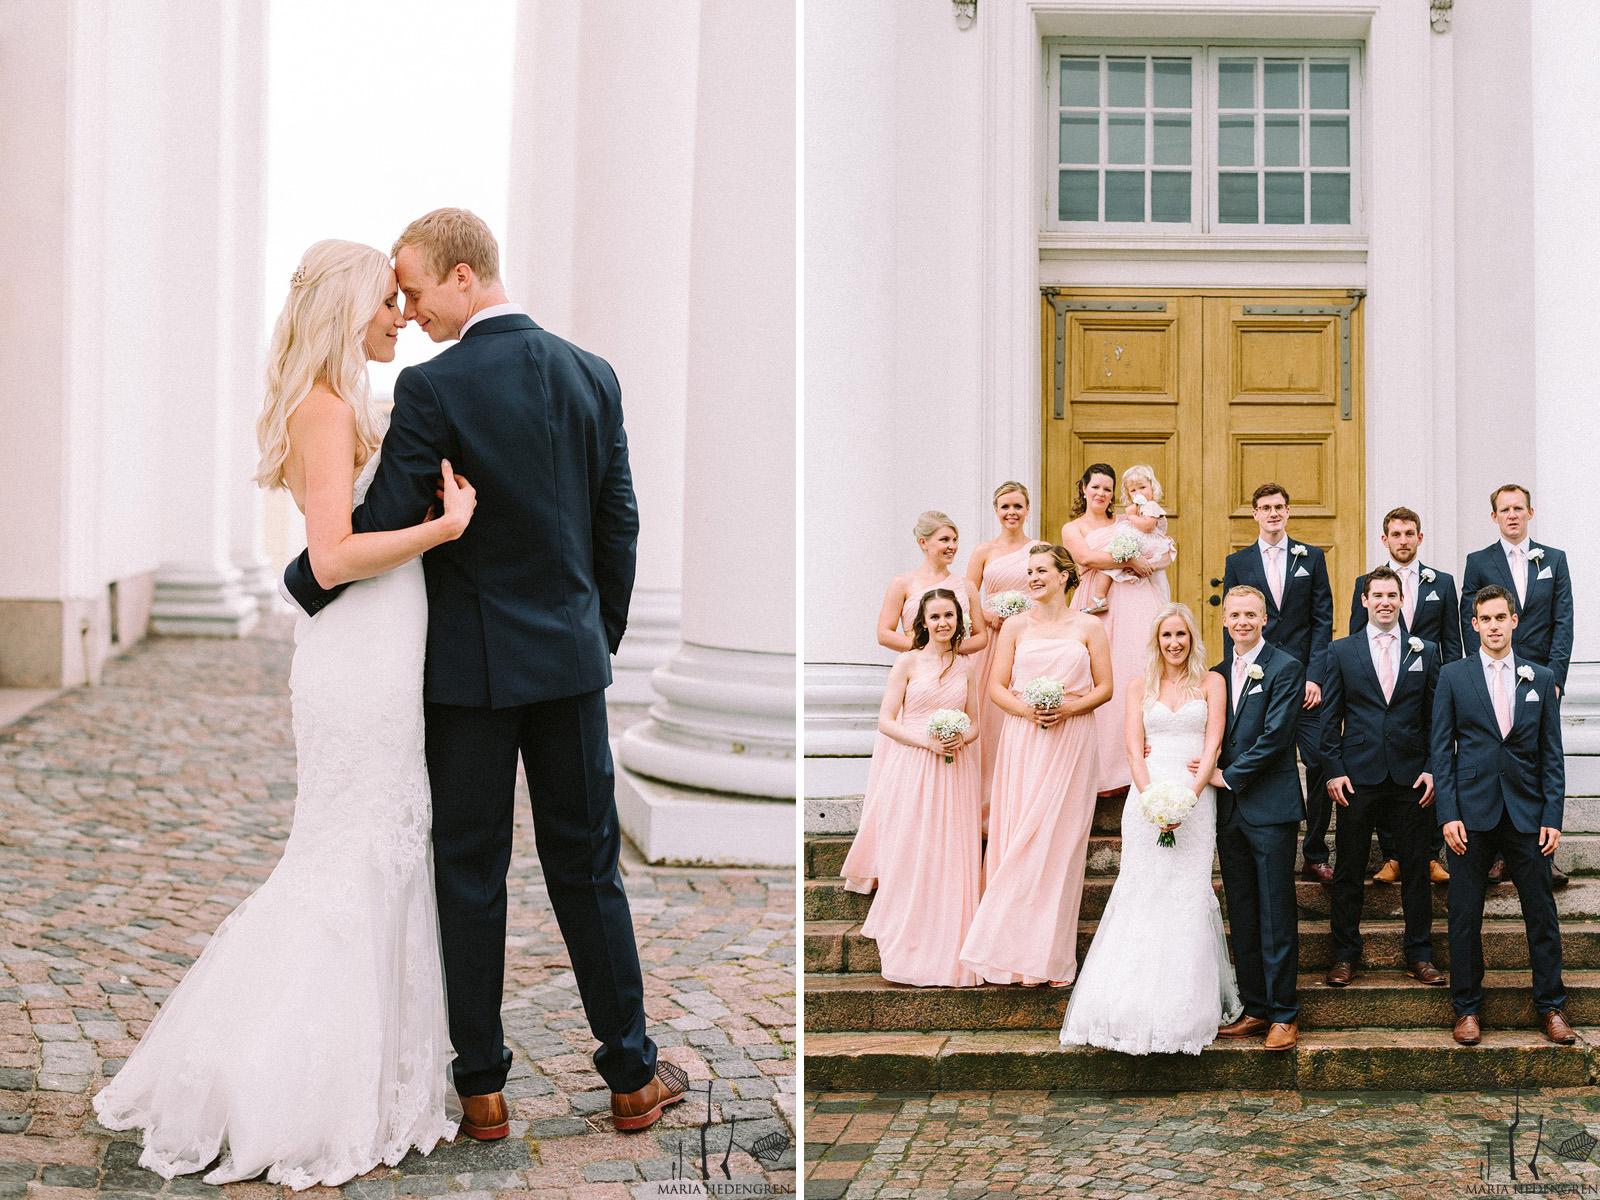 Helsinki cathedral wedding photos